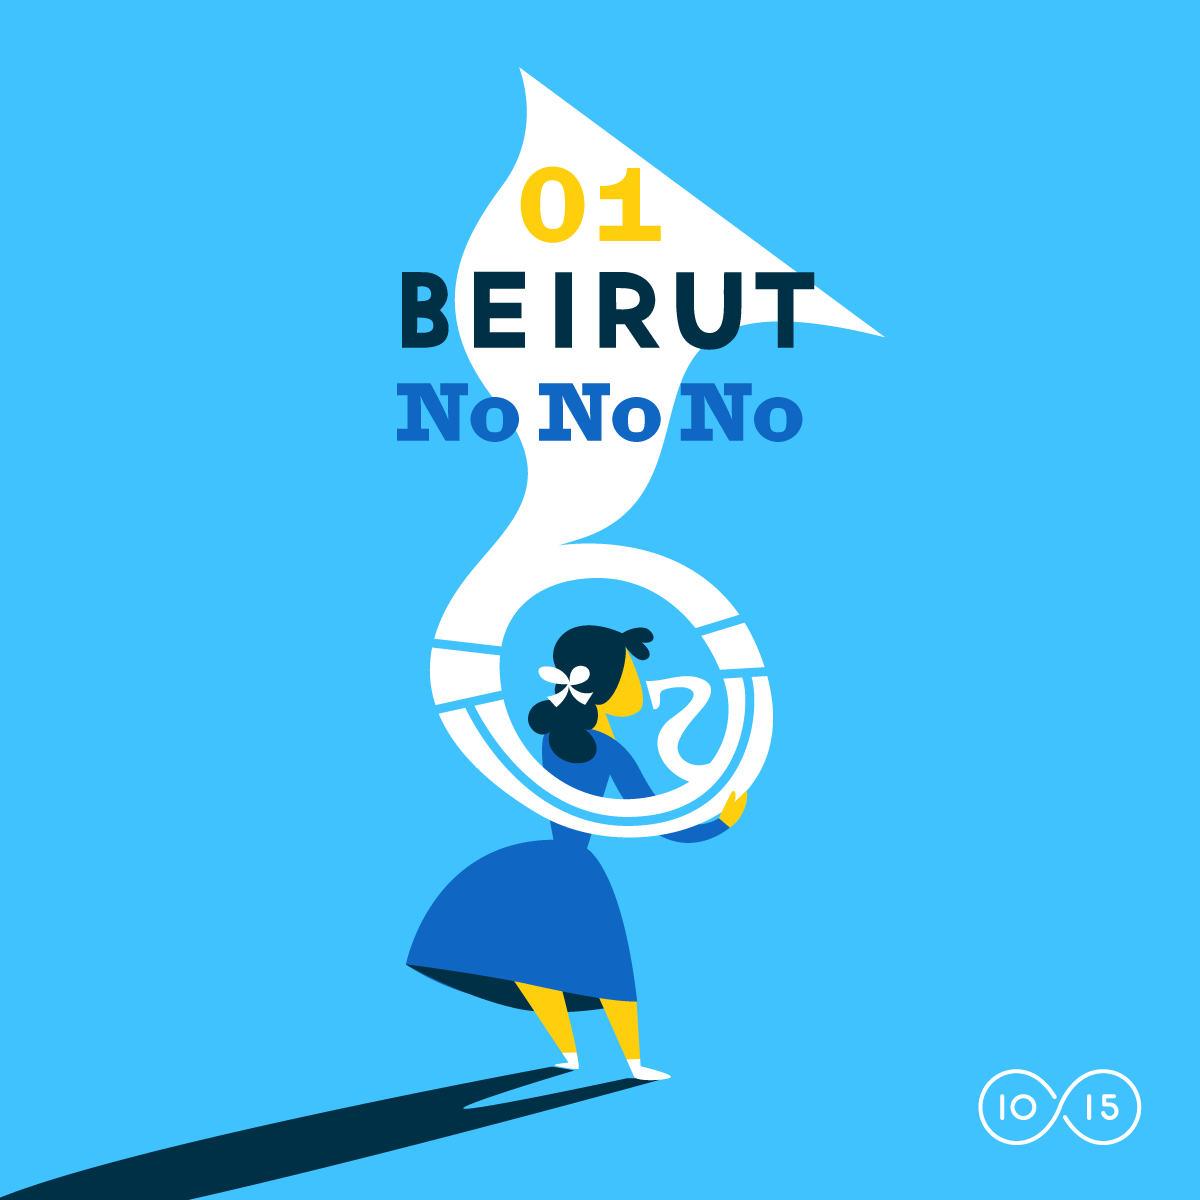 01_Beirut